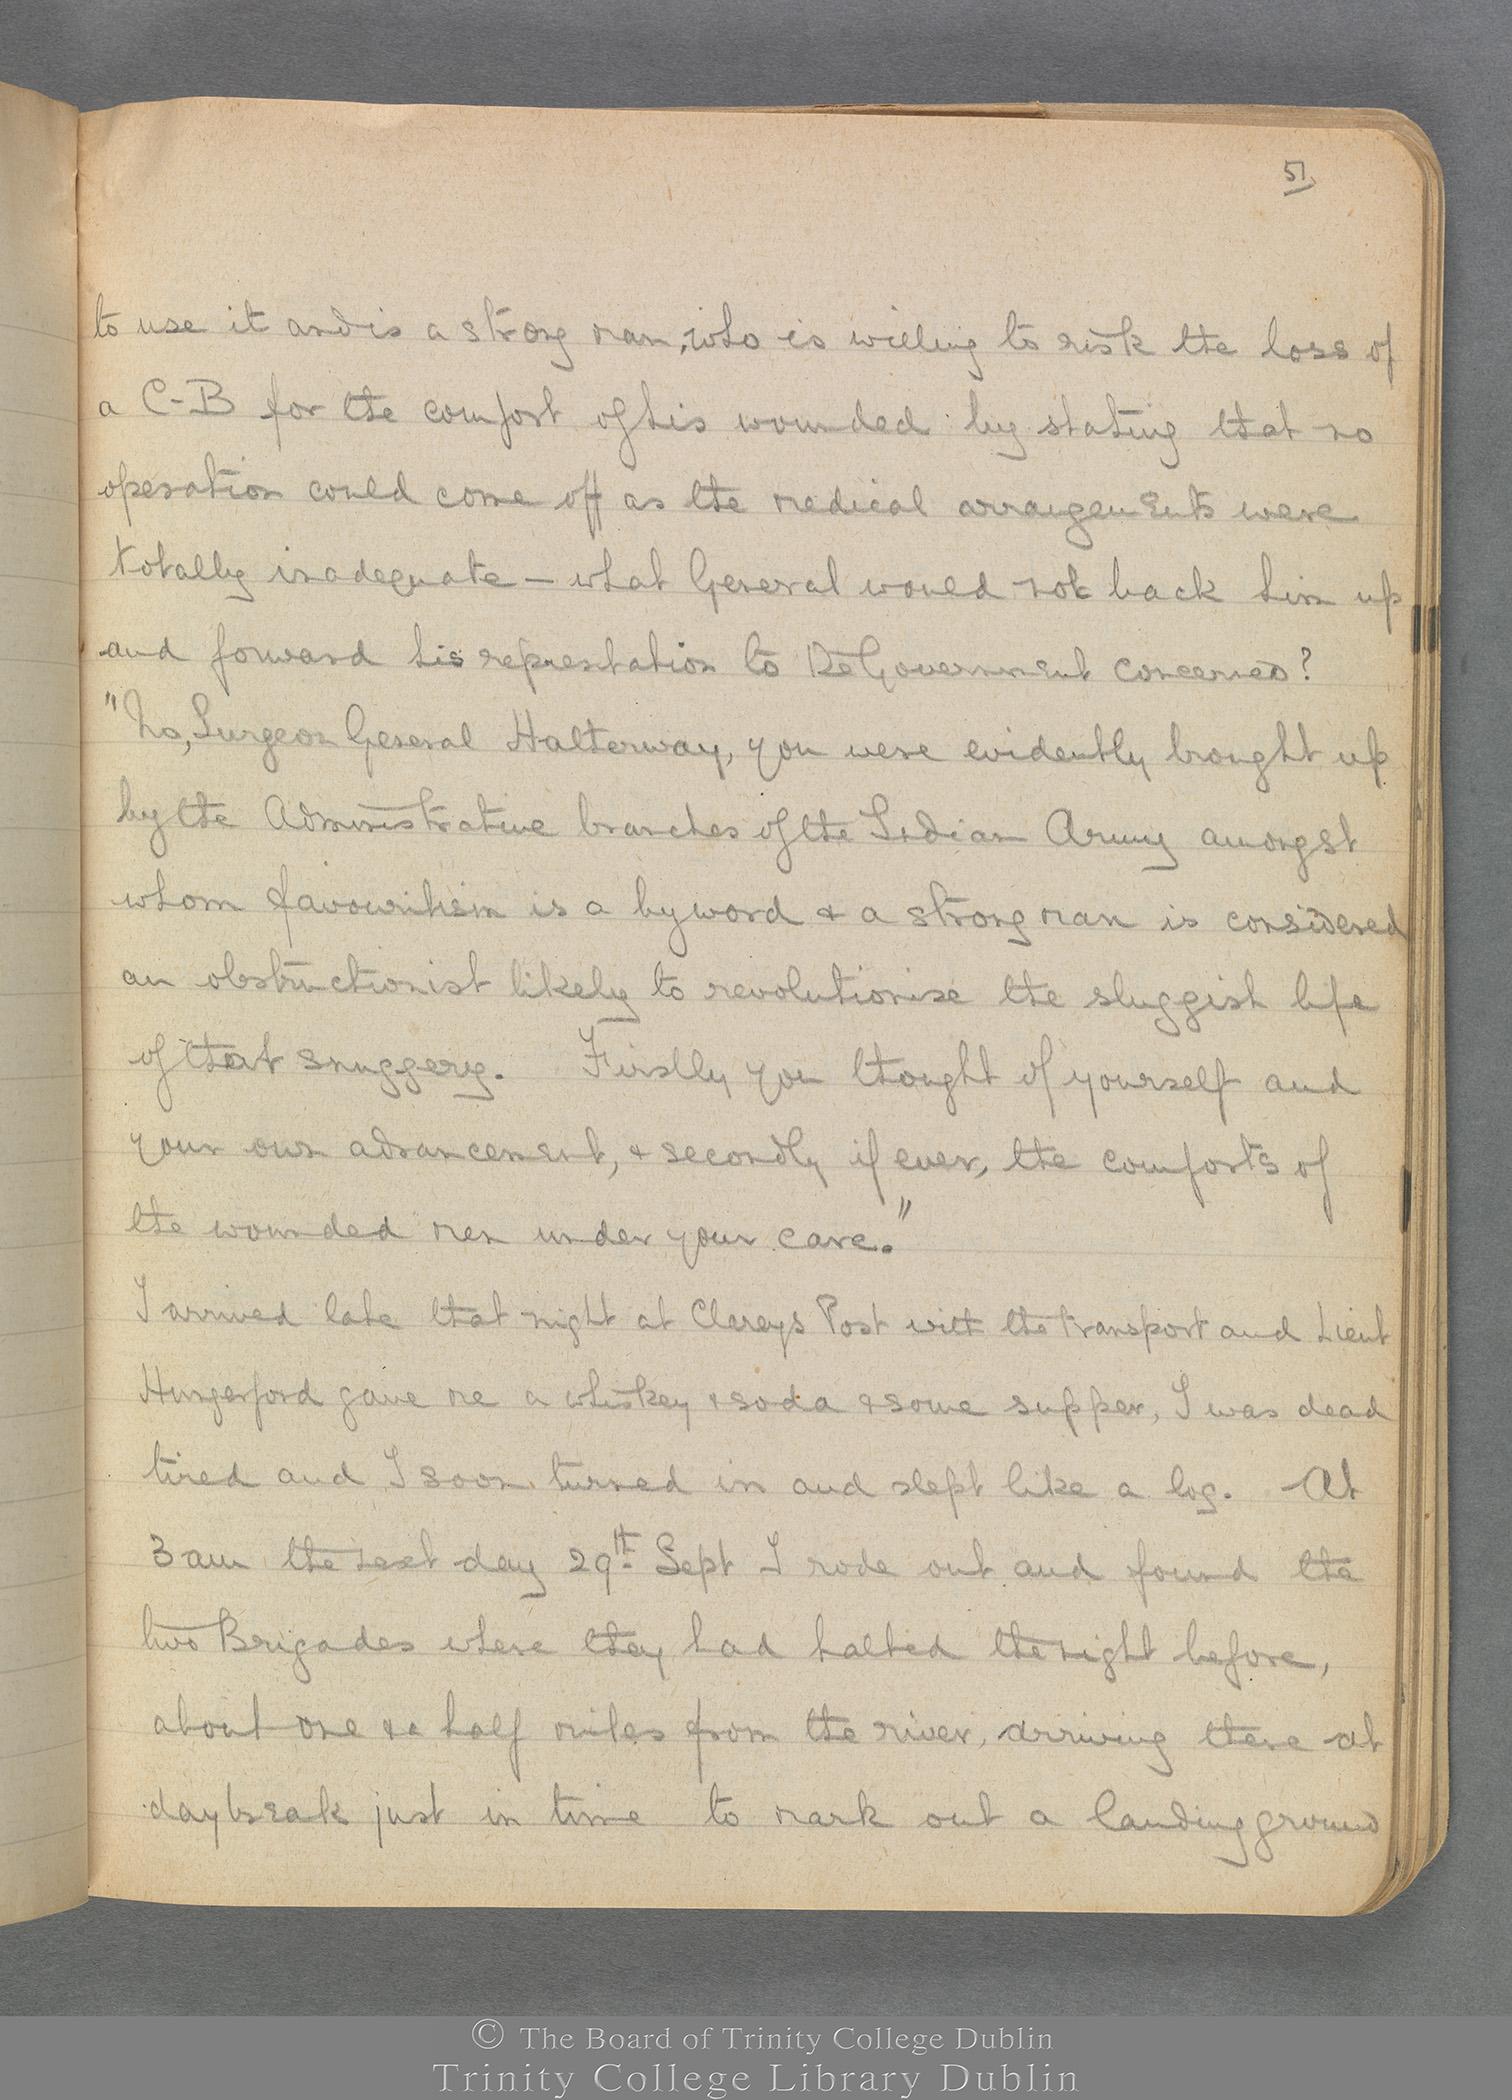 TCD MS 3414 folio 51 recto